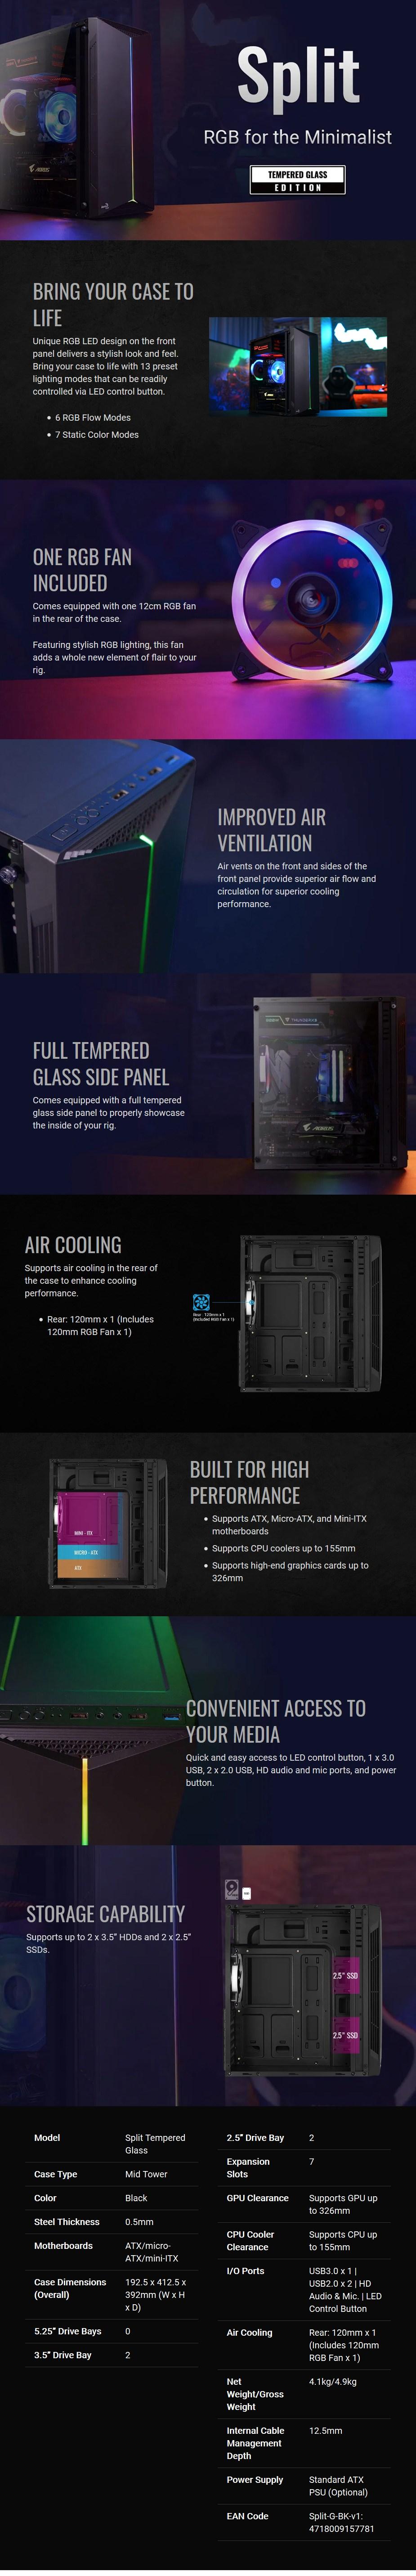 Aerocool Split Tempered Glass RGB ATX Mid-Tower Case - Black - Overview 1